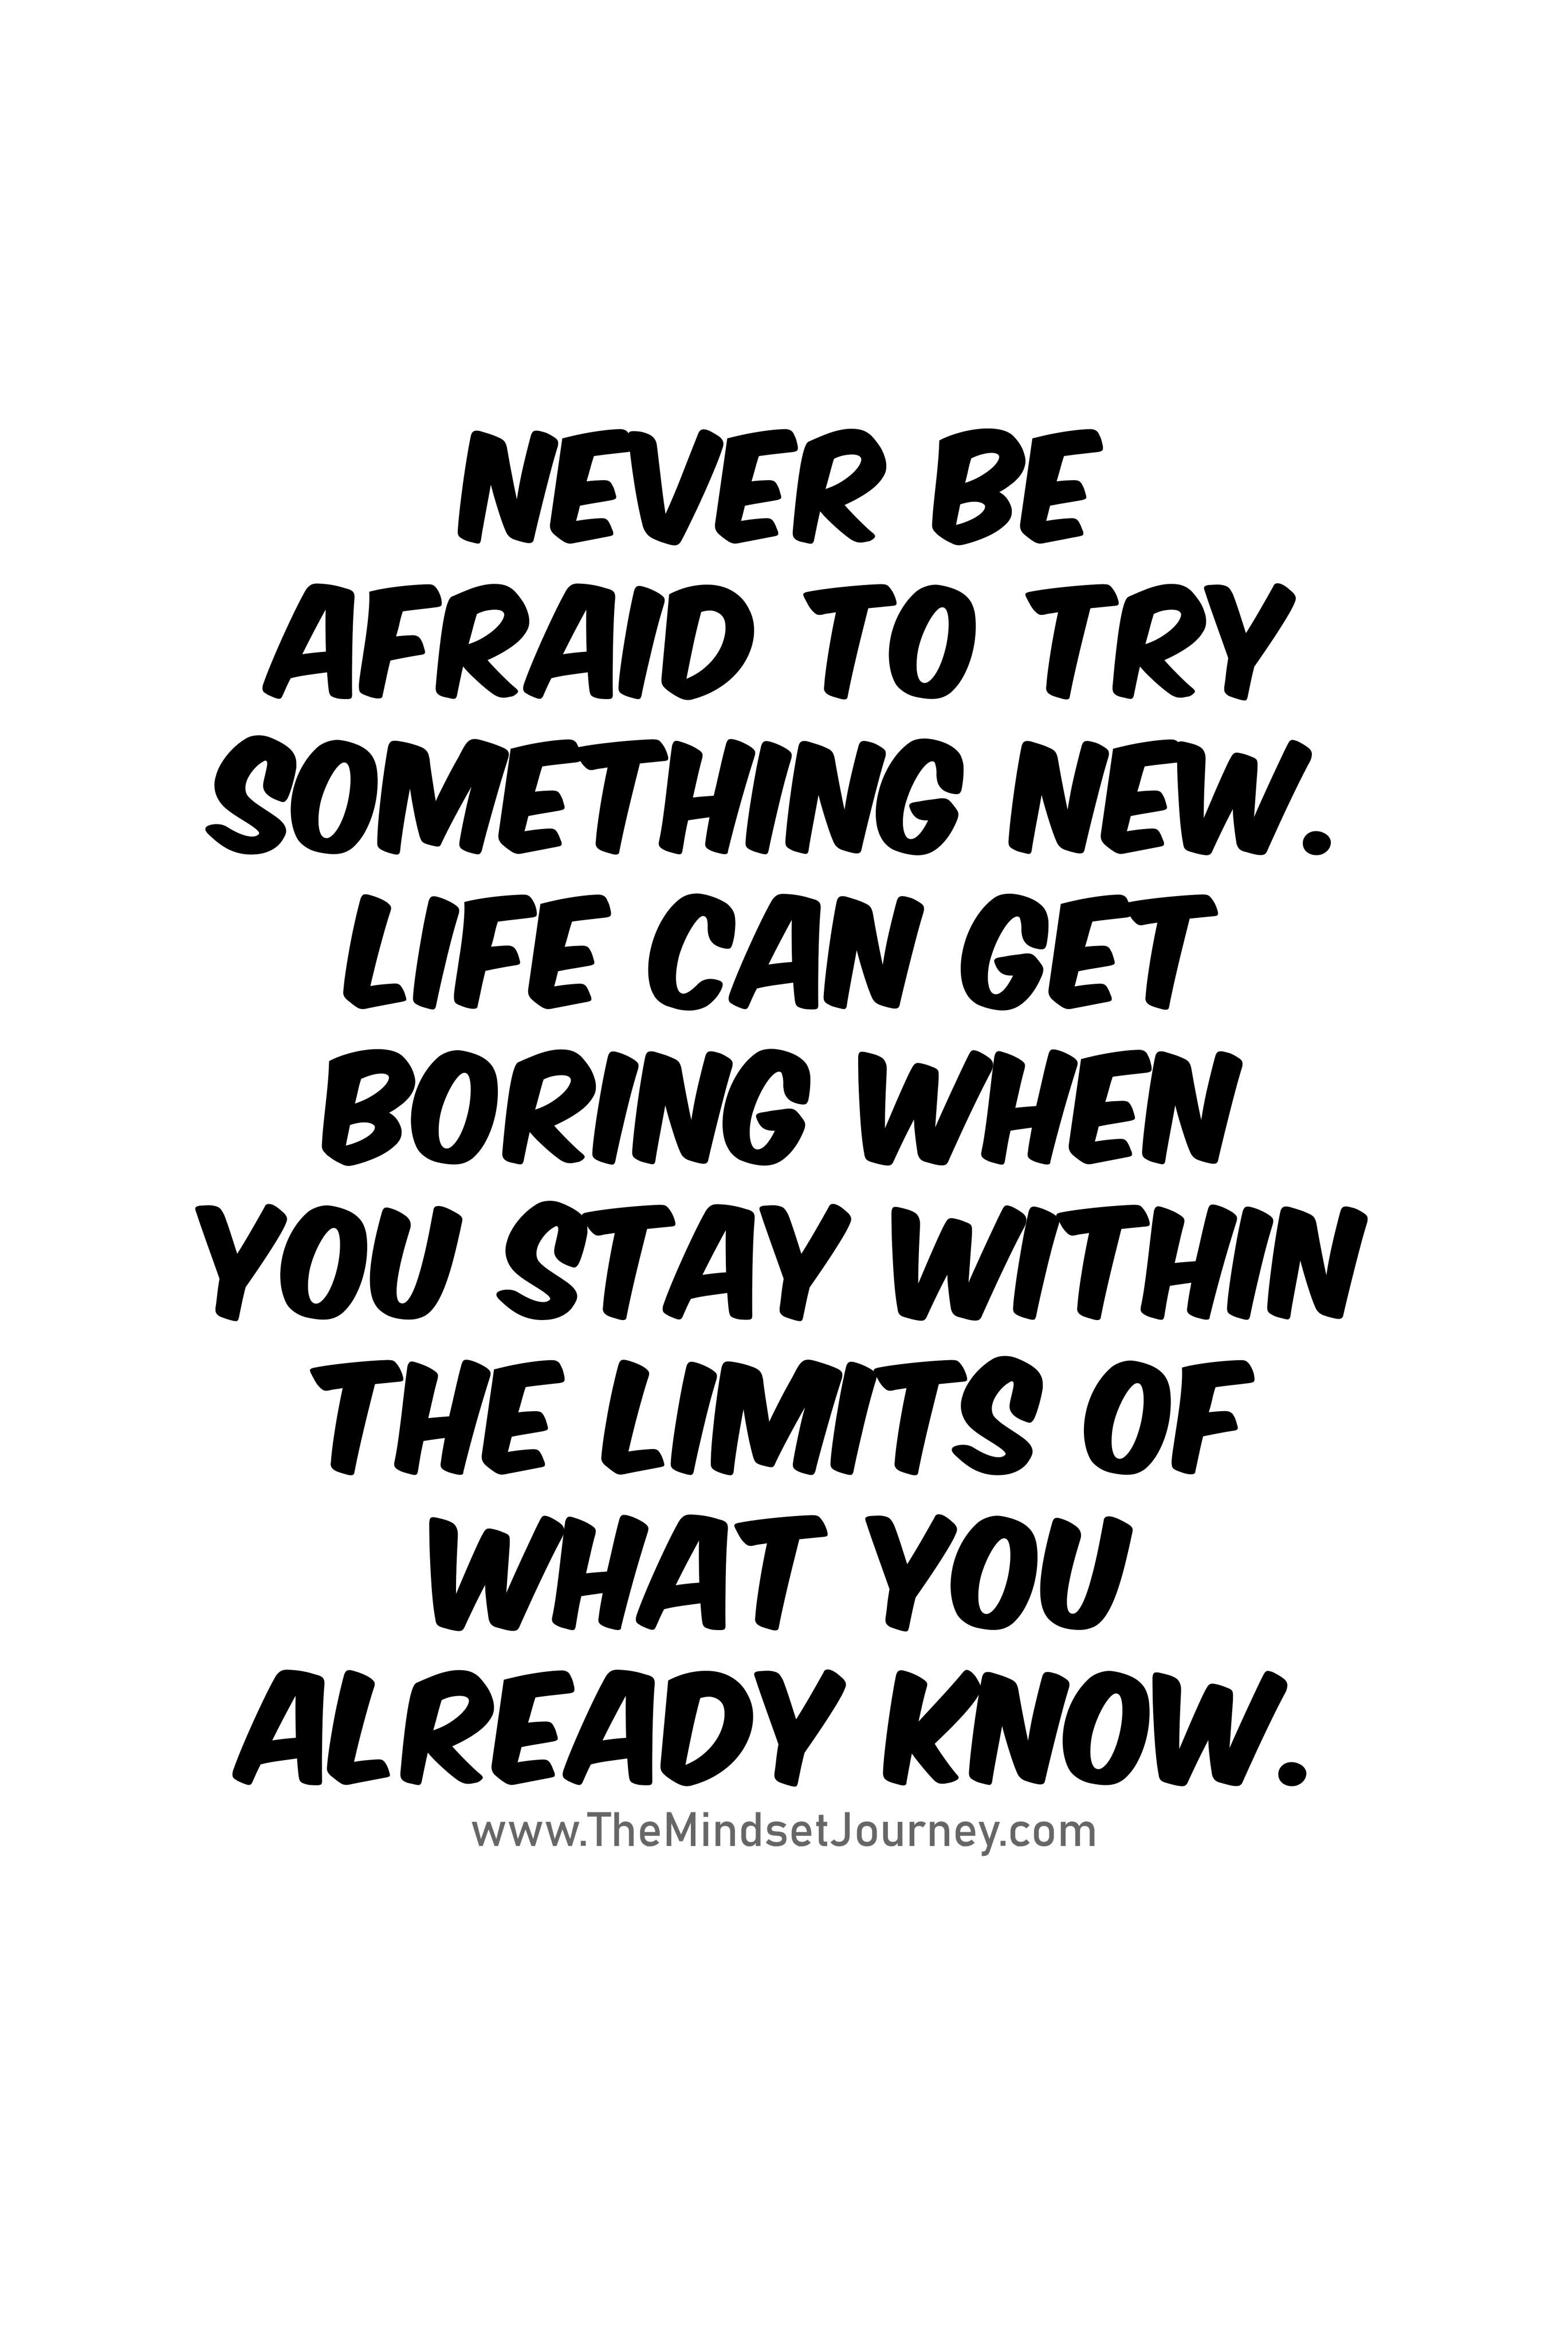 Boring Life Quotes Family Quotes Boring Life Quotes Something New Quotes Trying Something New Quotes